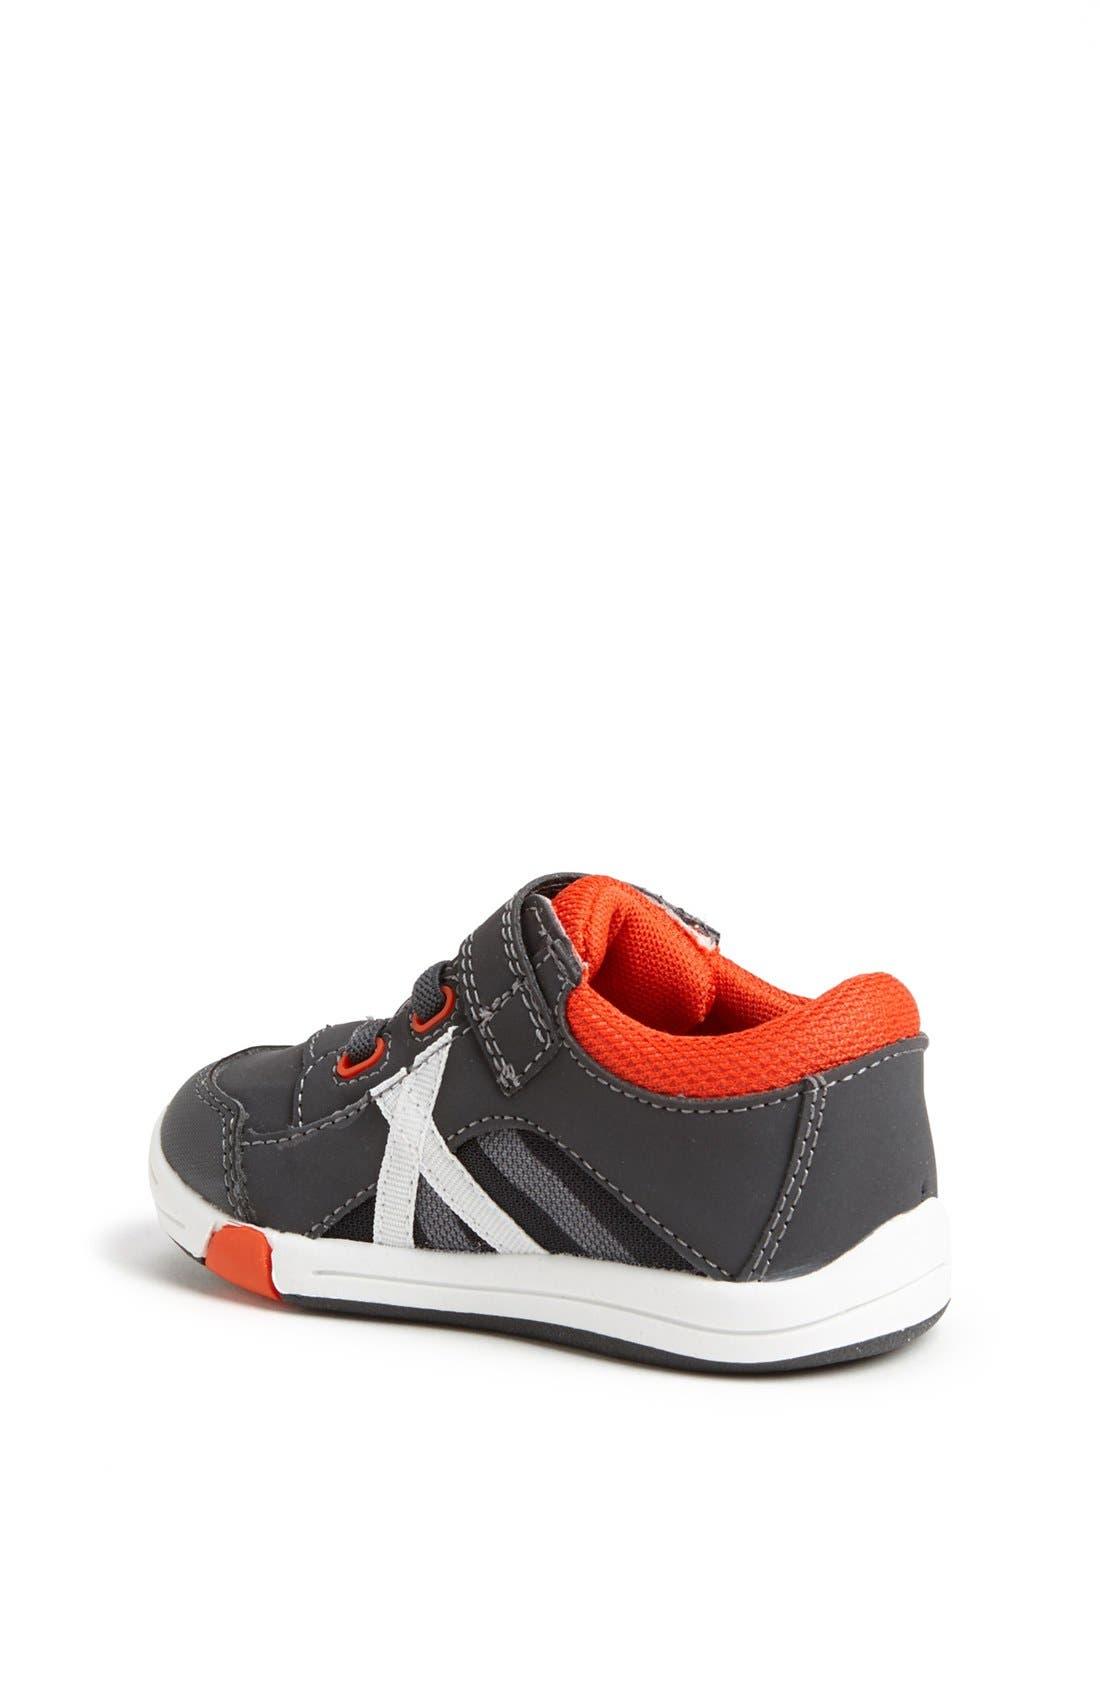 Alternate Image 2  - Jumping Jacks 'Finish Line' Sneaker (Baby, Walker & Toddler)